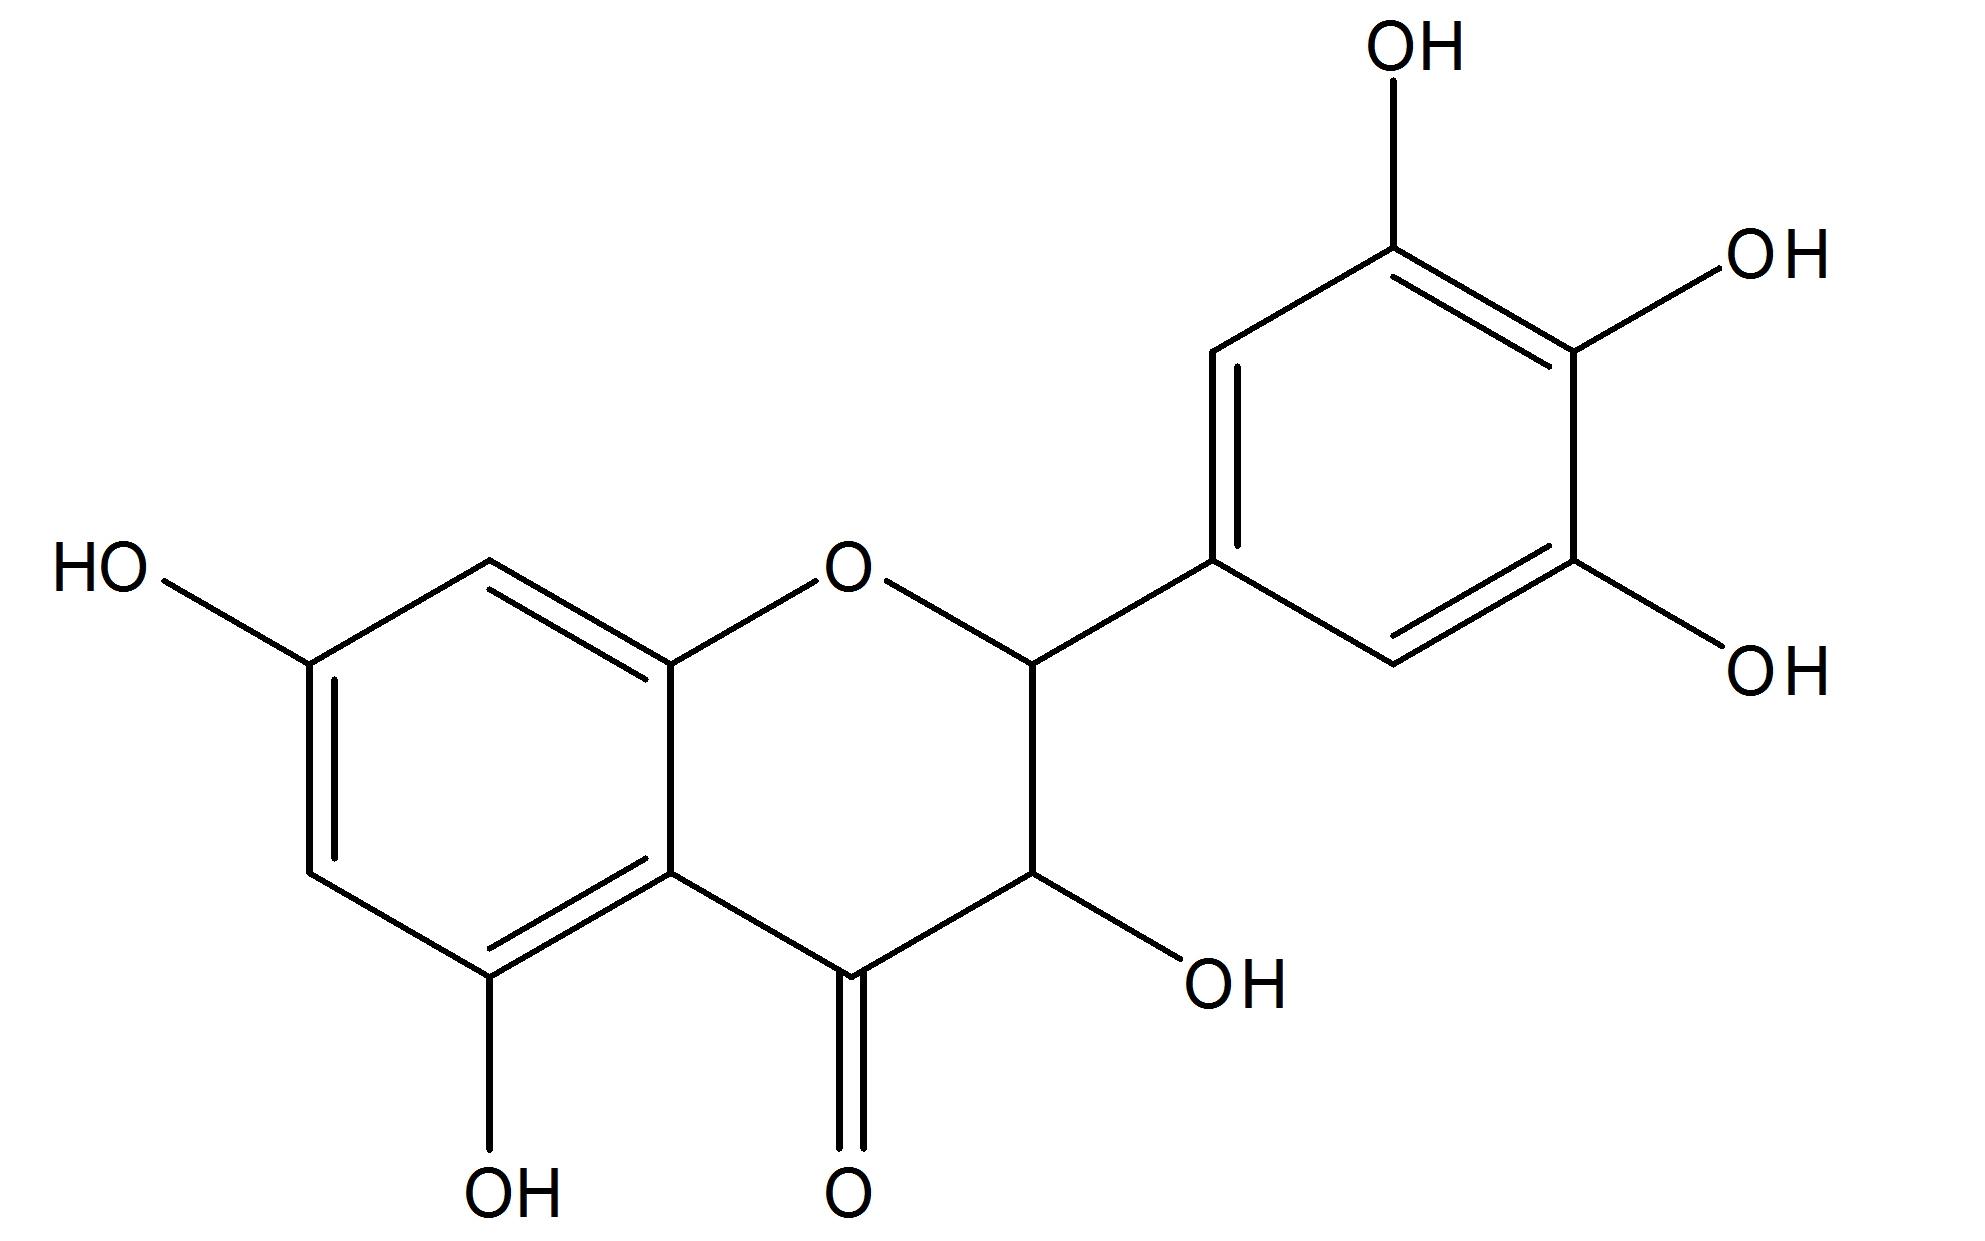 Dihydromyricetin Stops Rats Getting Drunk Dhm Anti